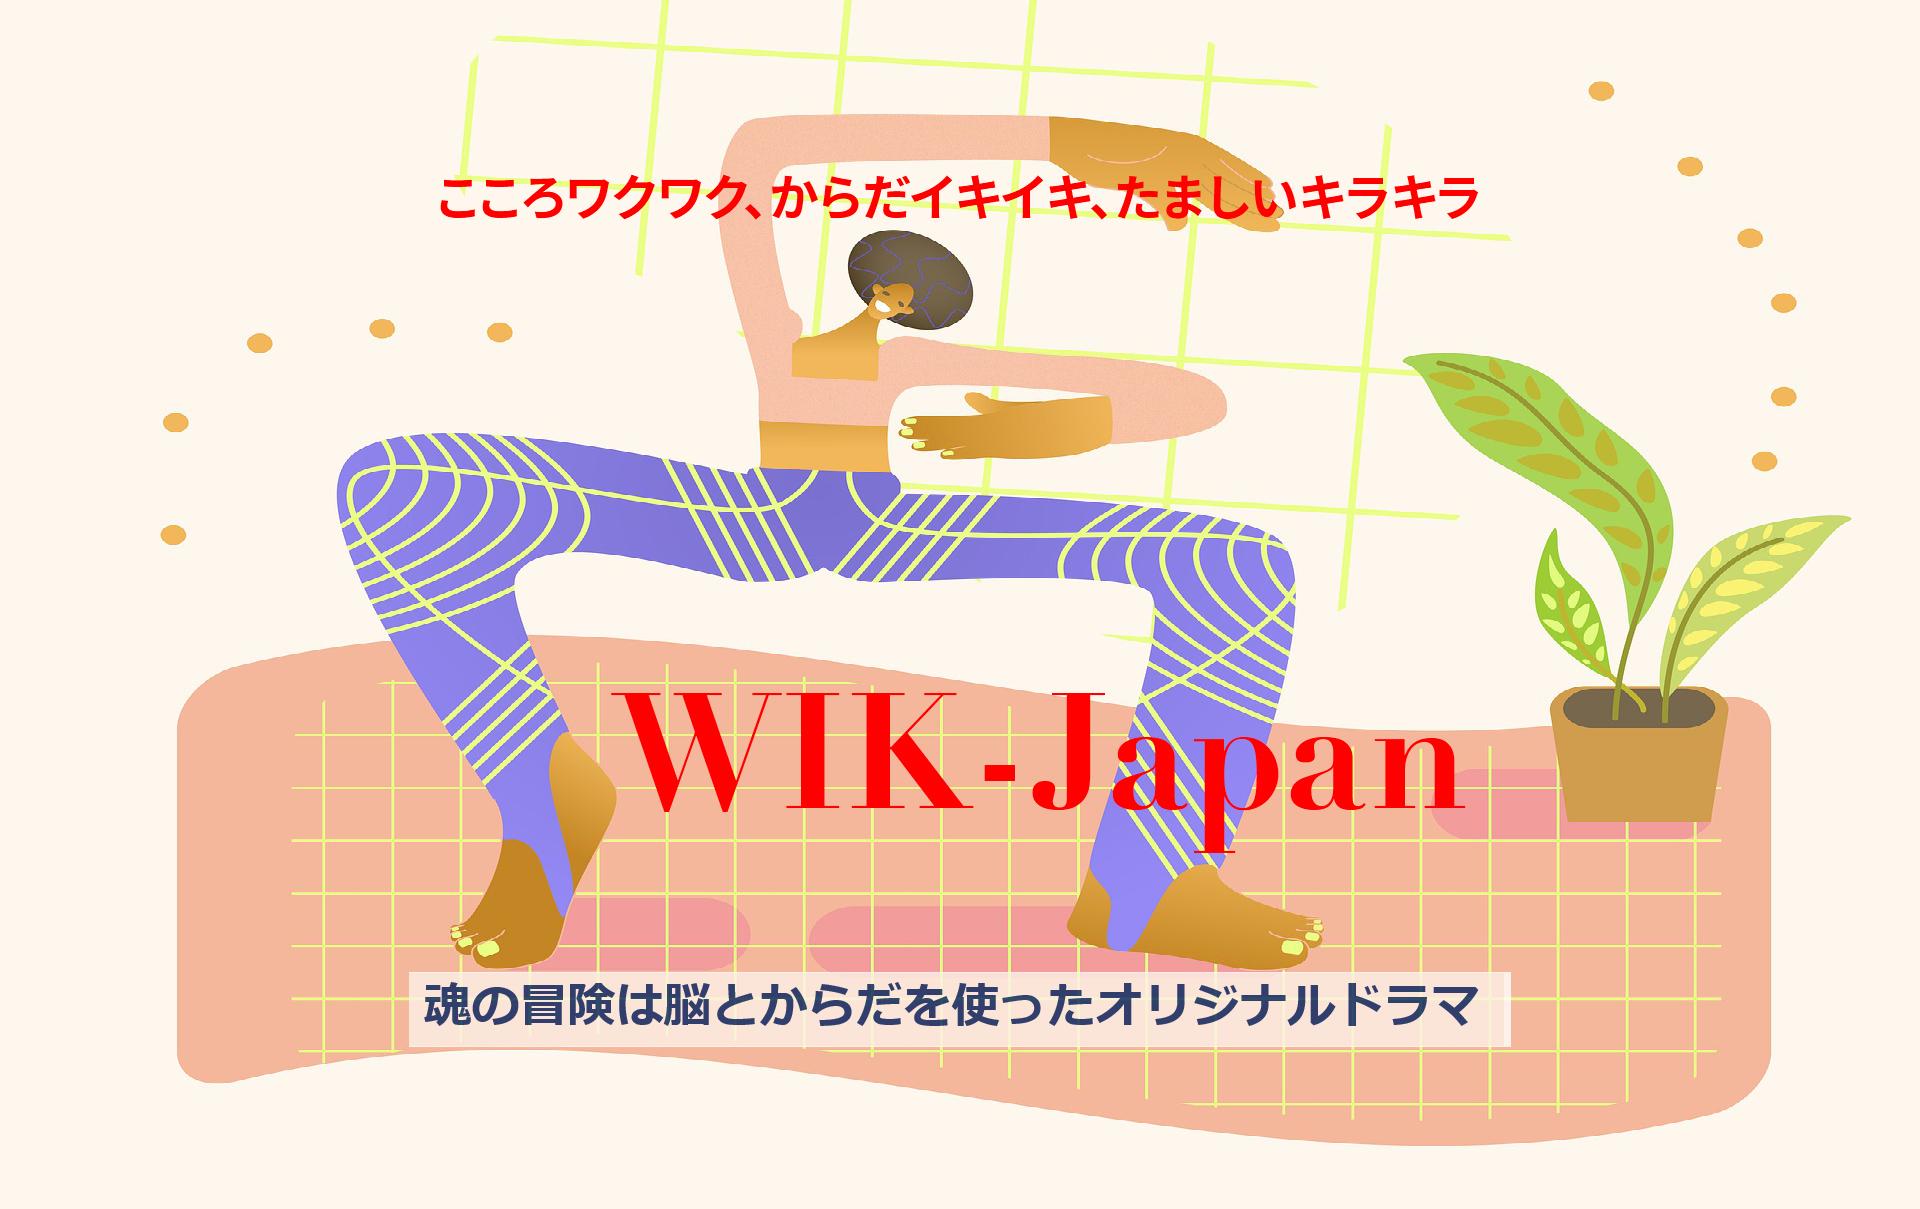 WIK JAPAN